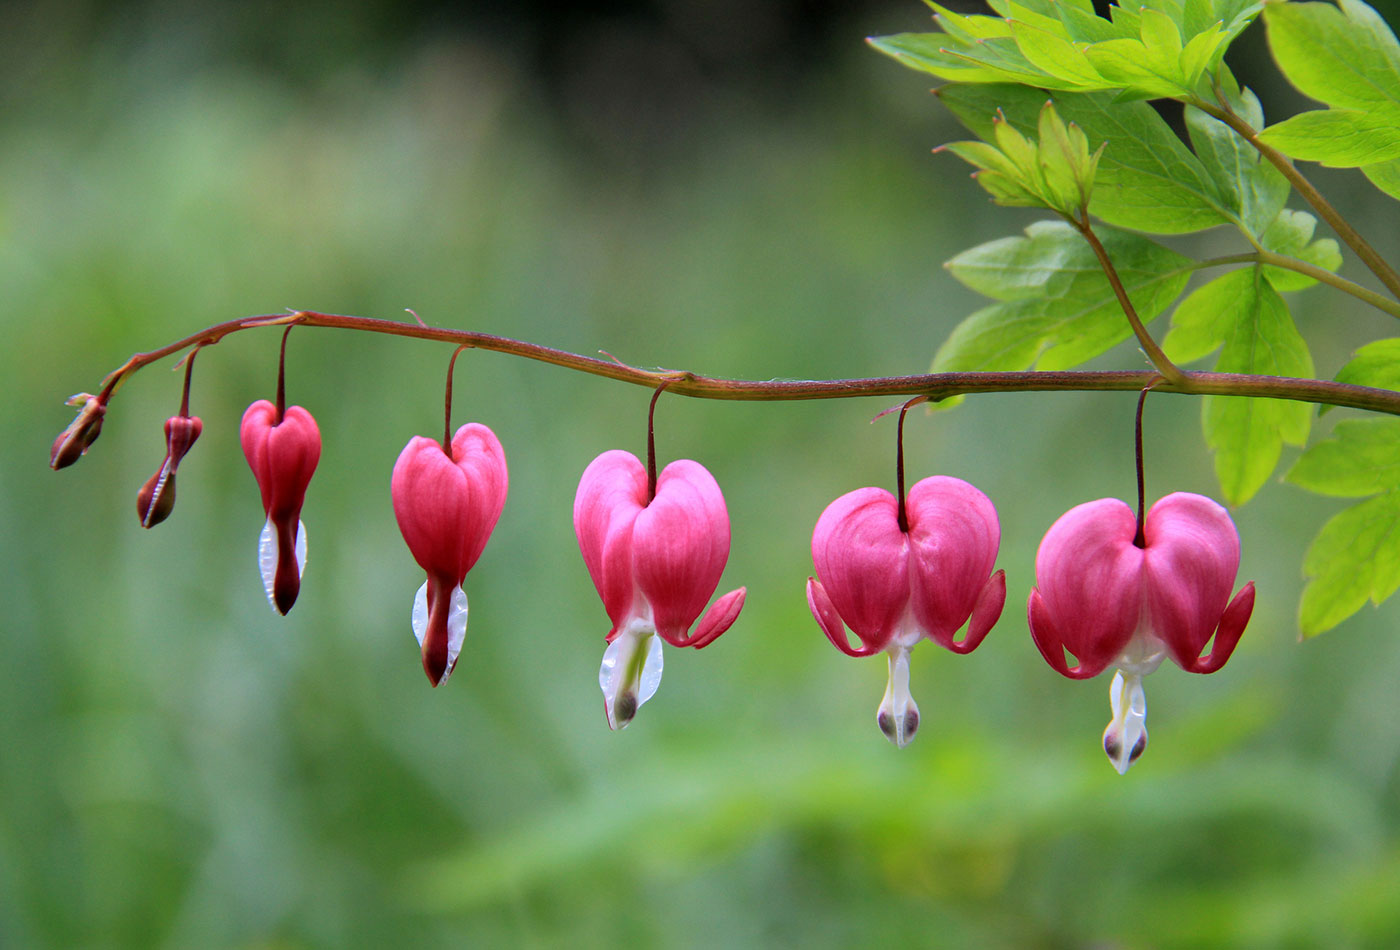 Growing Hearts.